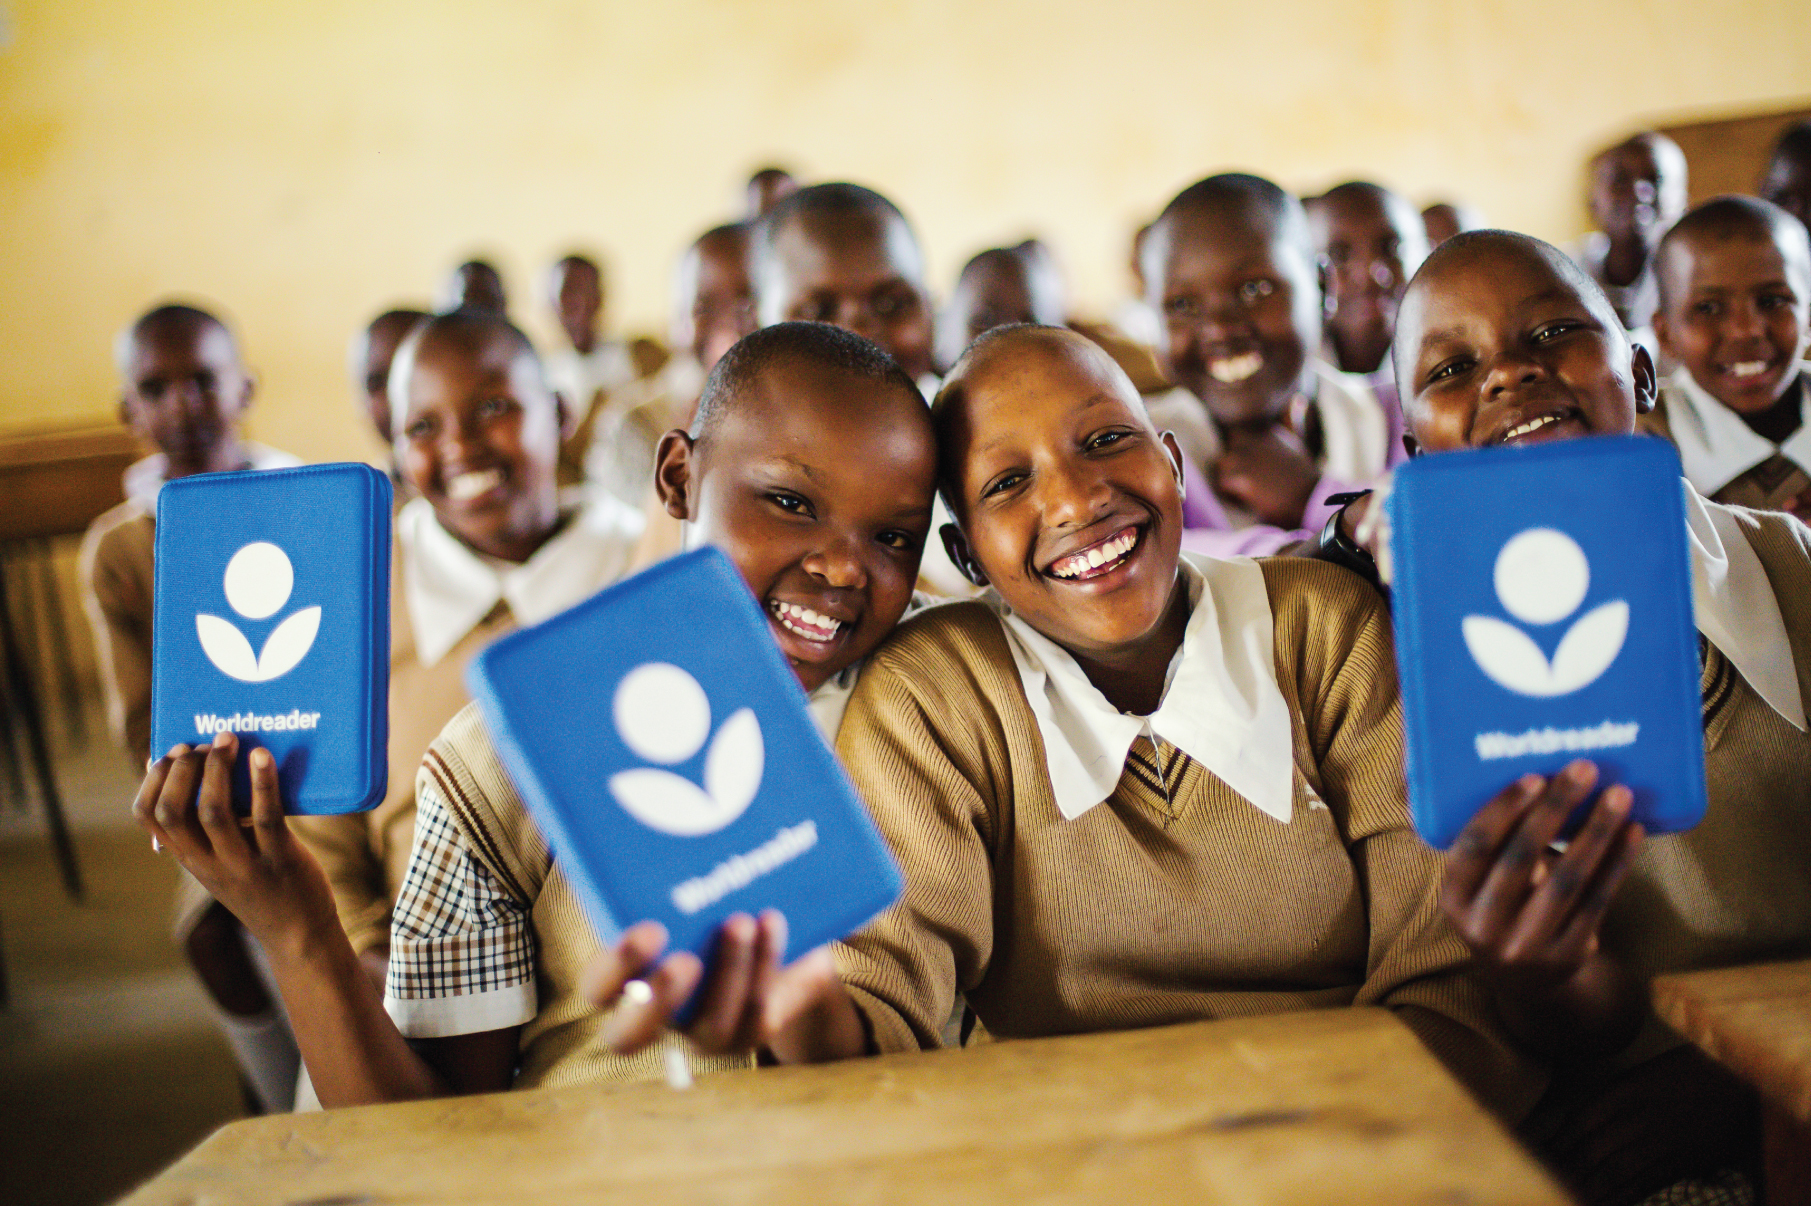 Happy Worldreader BLUE Box students